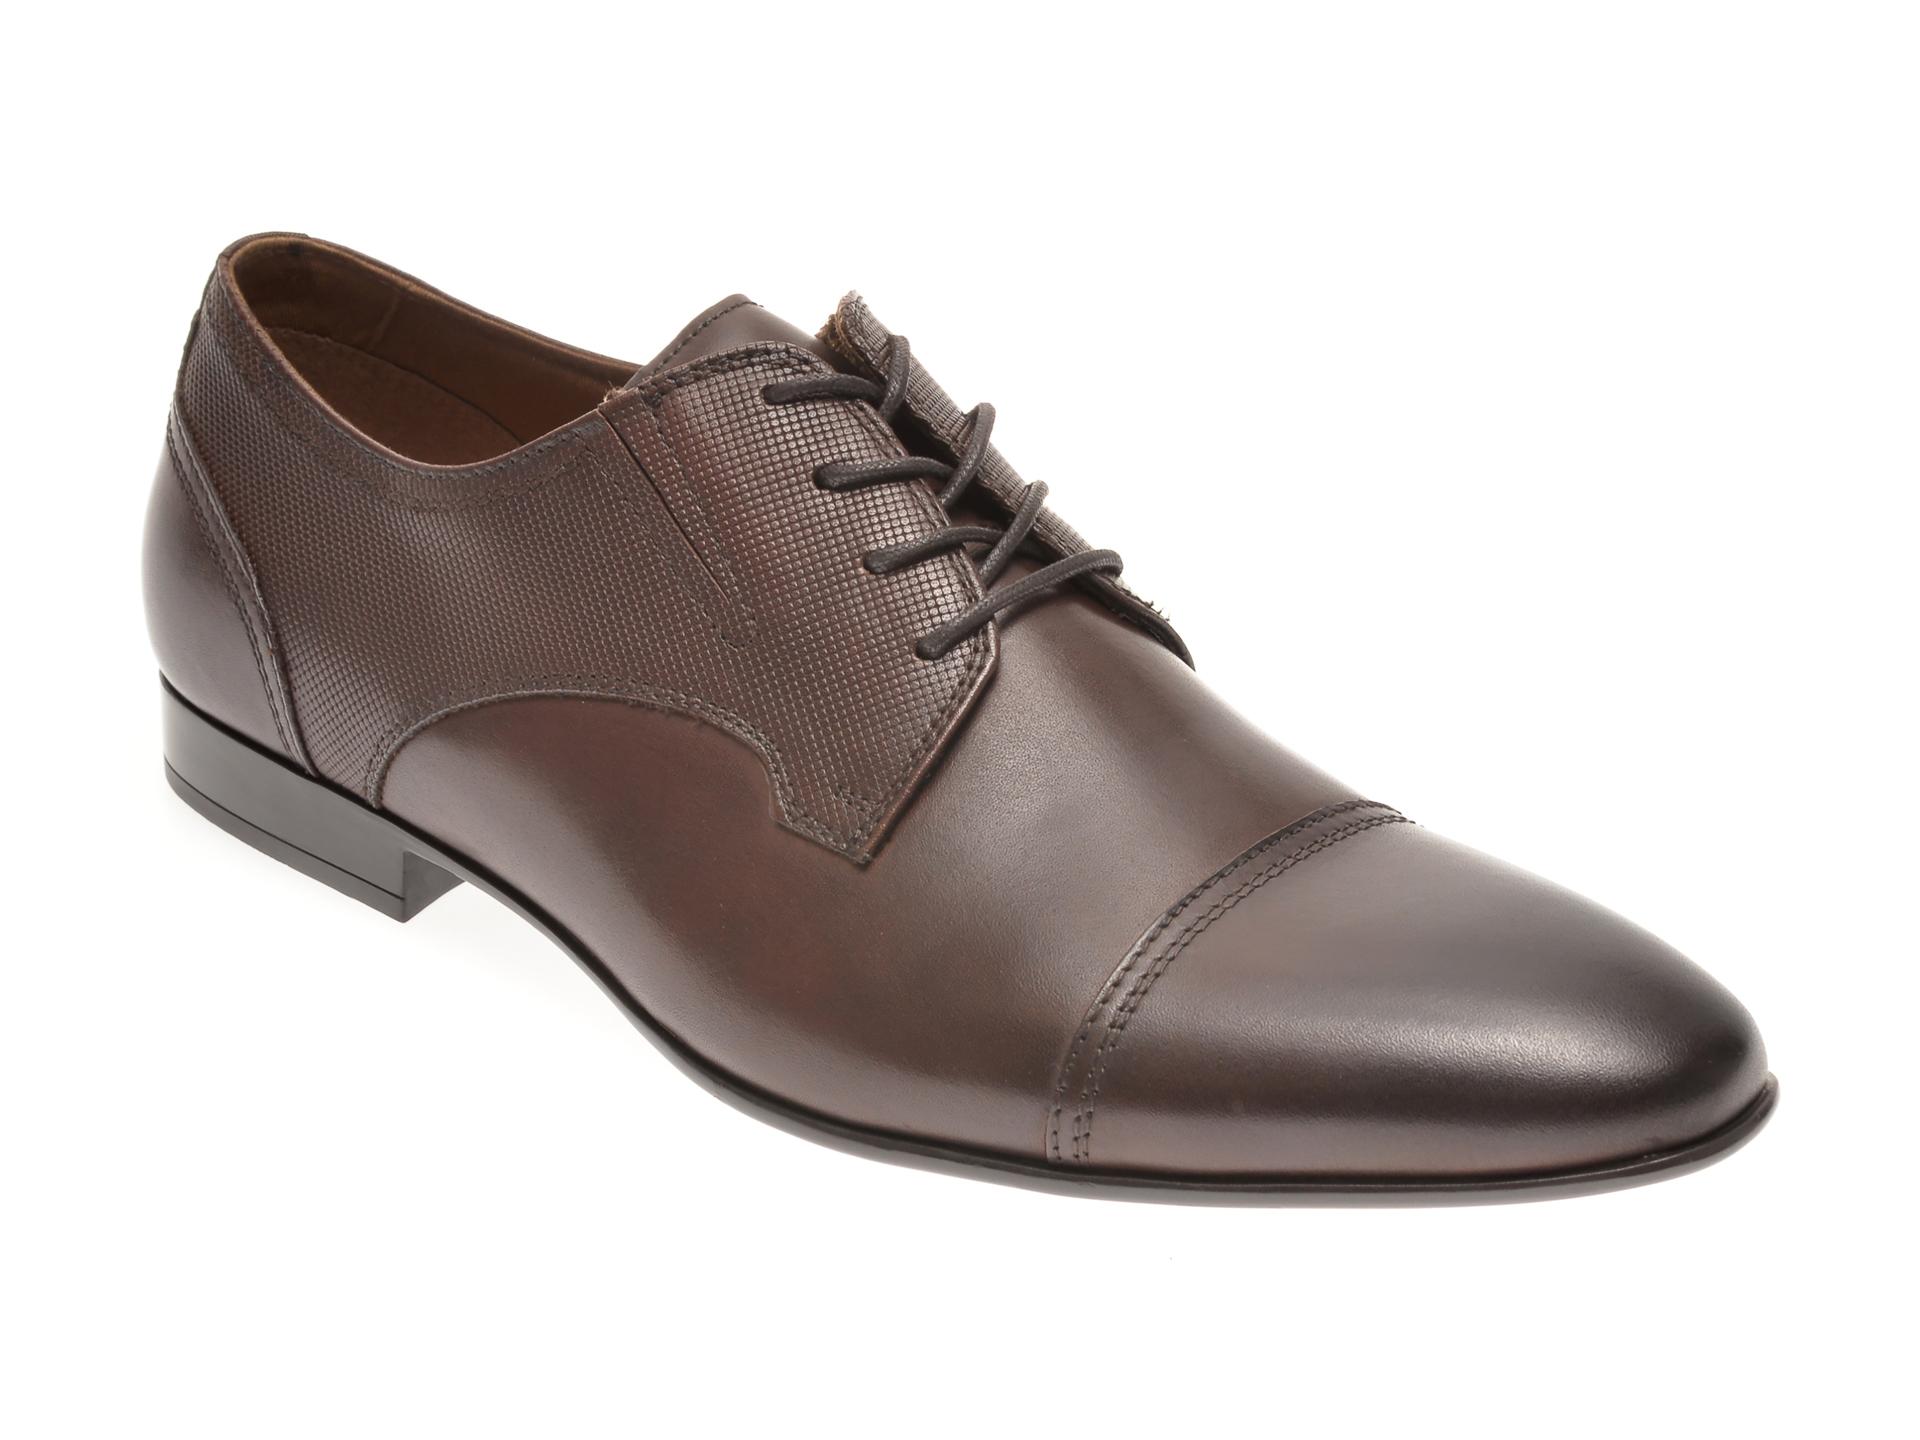 Pantofi ALDO maro, Neustetten201, din piele naturala imagine otter.ro 2021